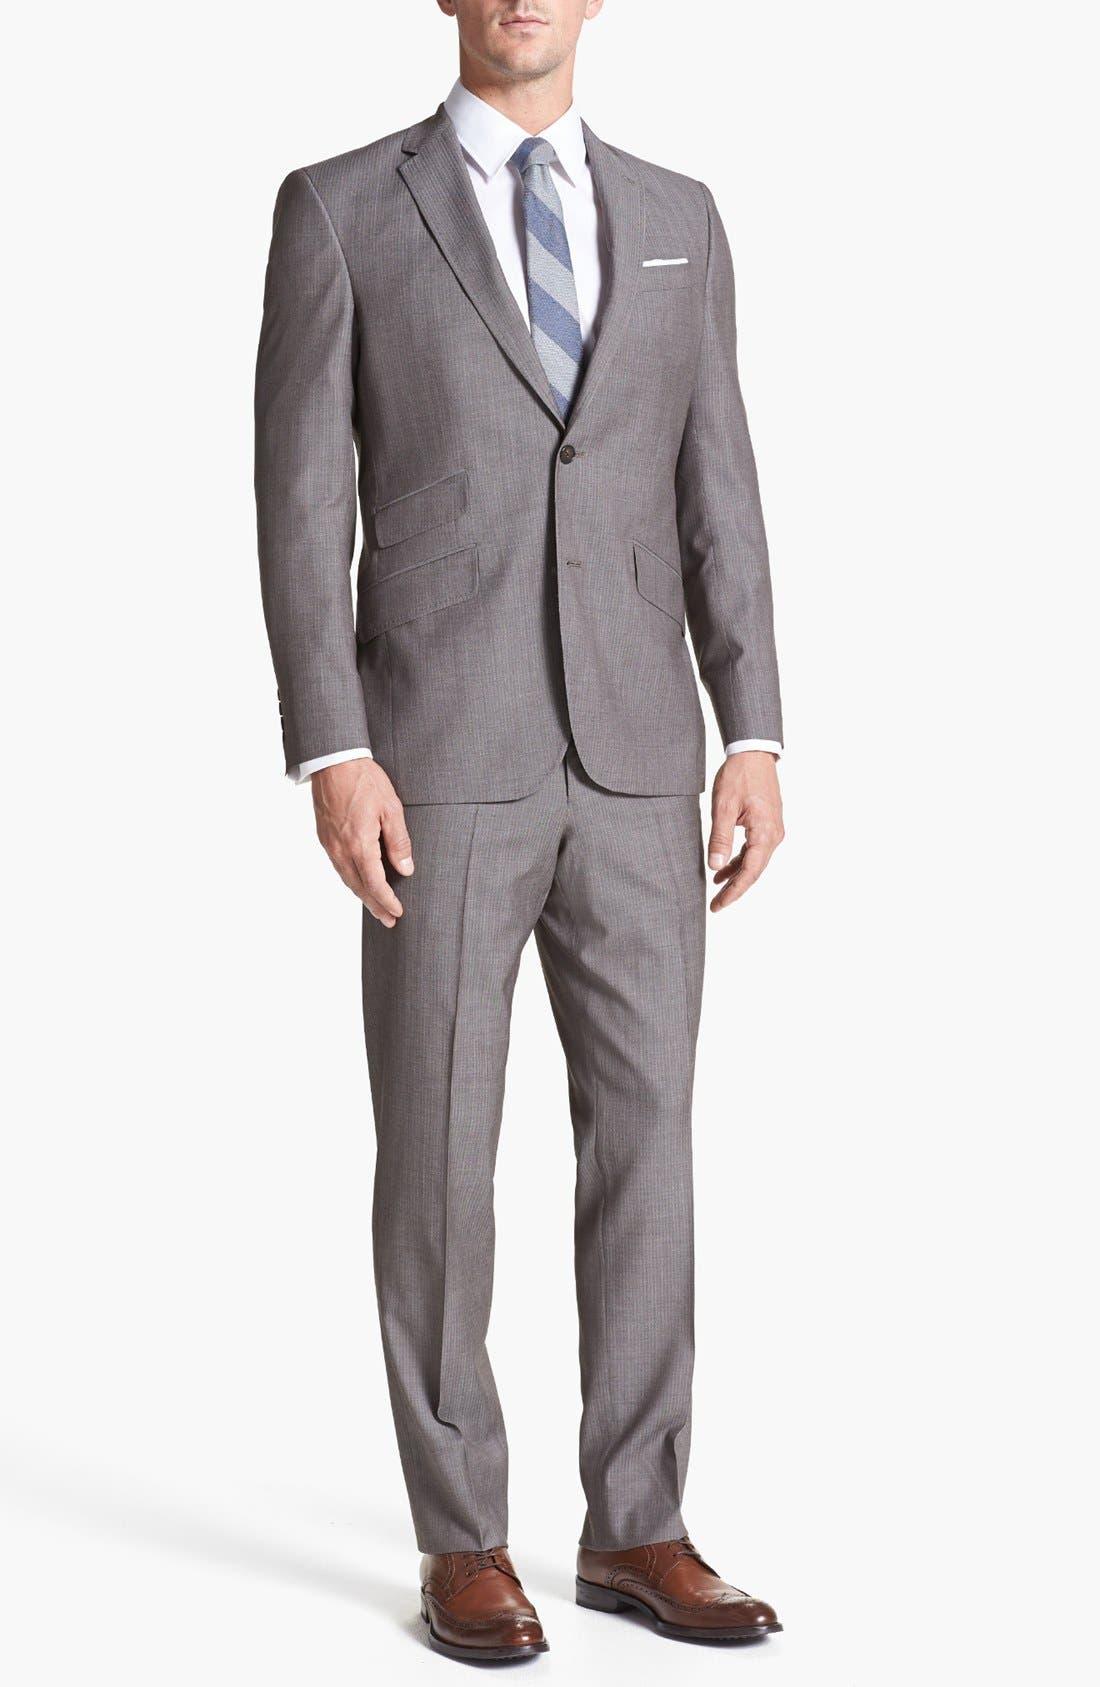 Alternate Image 1 Selected - Ted Baker London 'Jim' Tan Herringbone Wool Suit